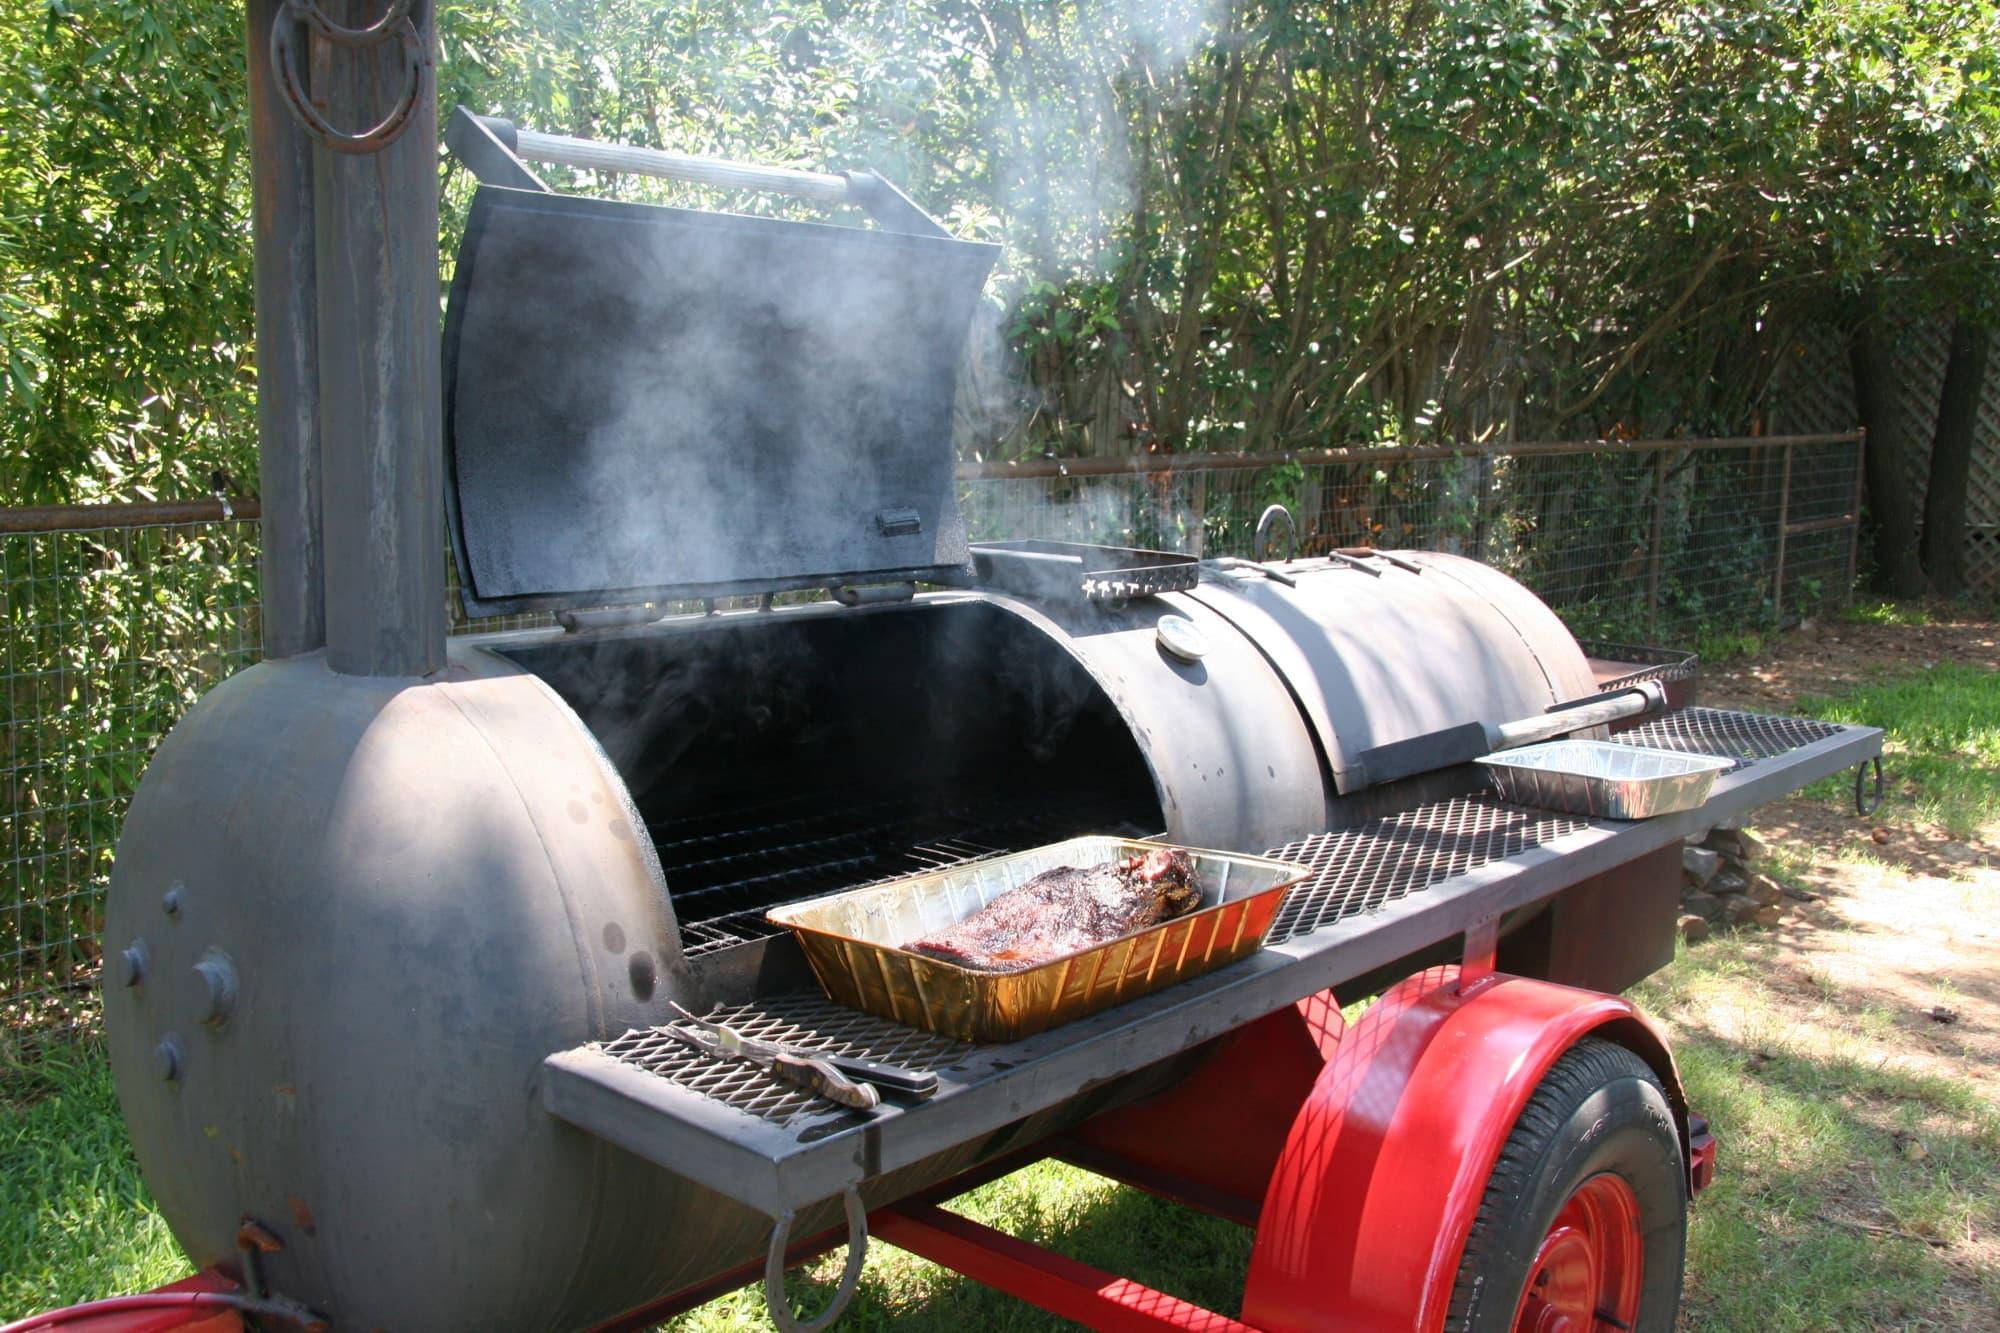 Big BBQ smoker with ribs